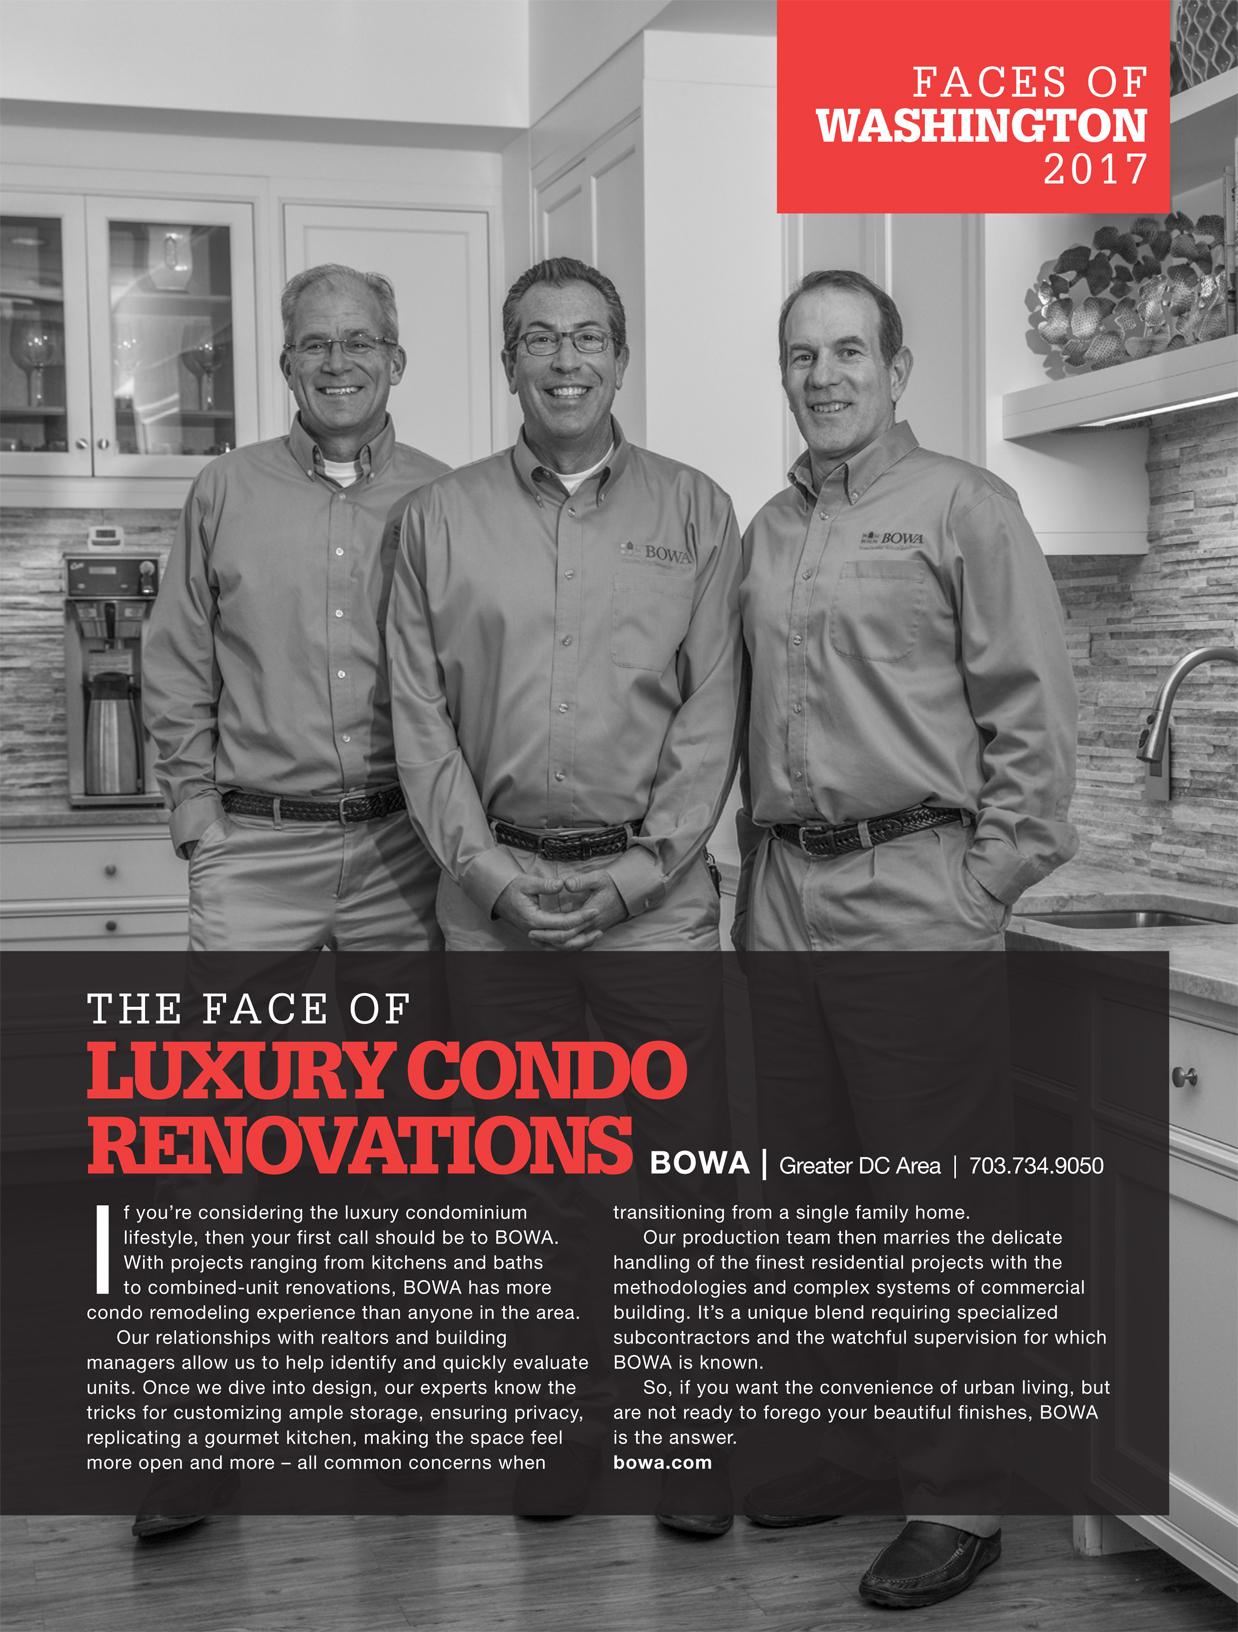 Washingtonian Profiles - Faces of Luxury Condo Renovations